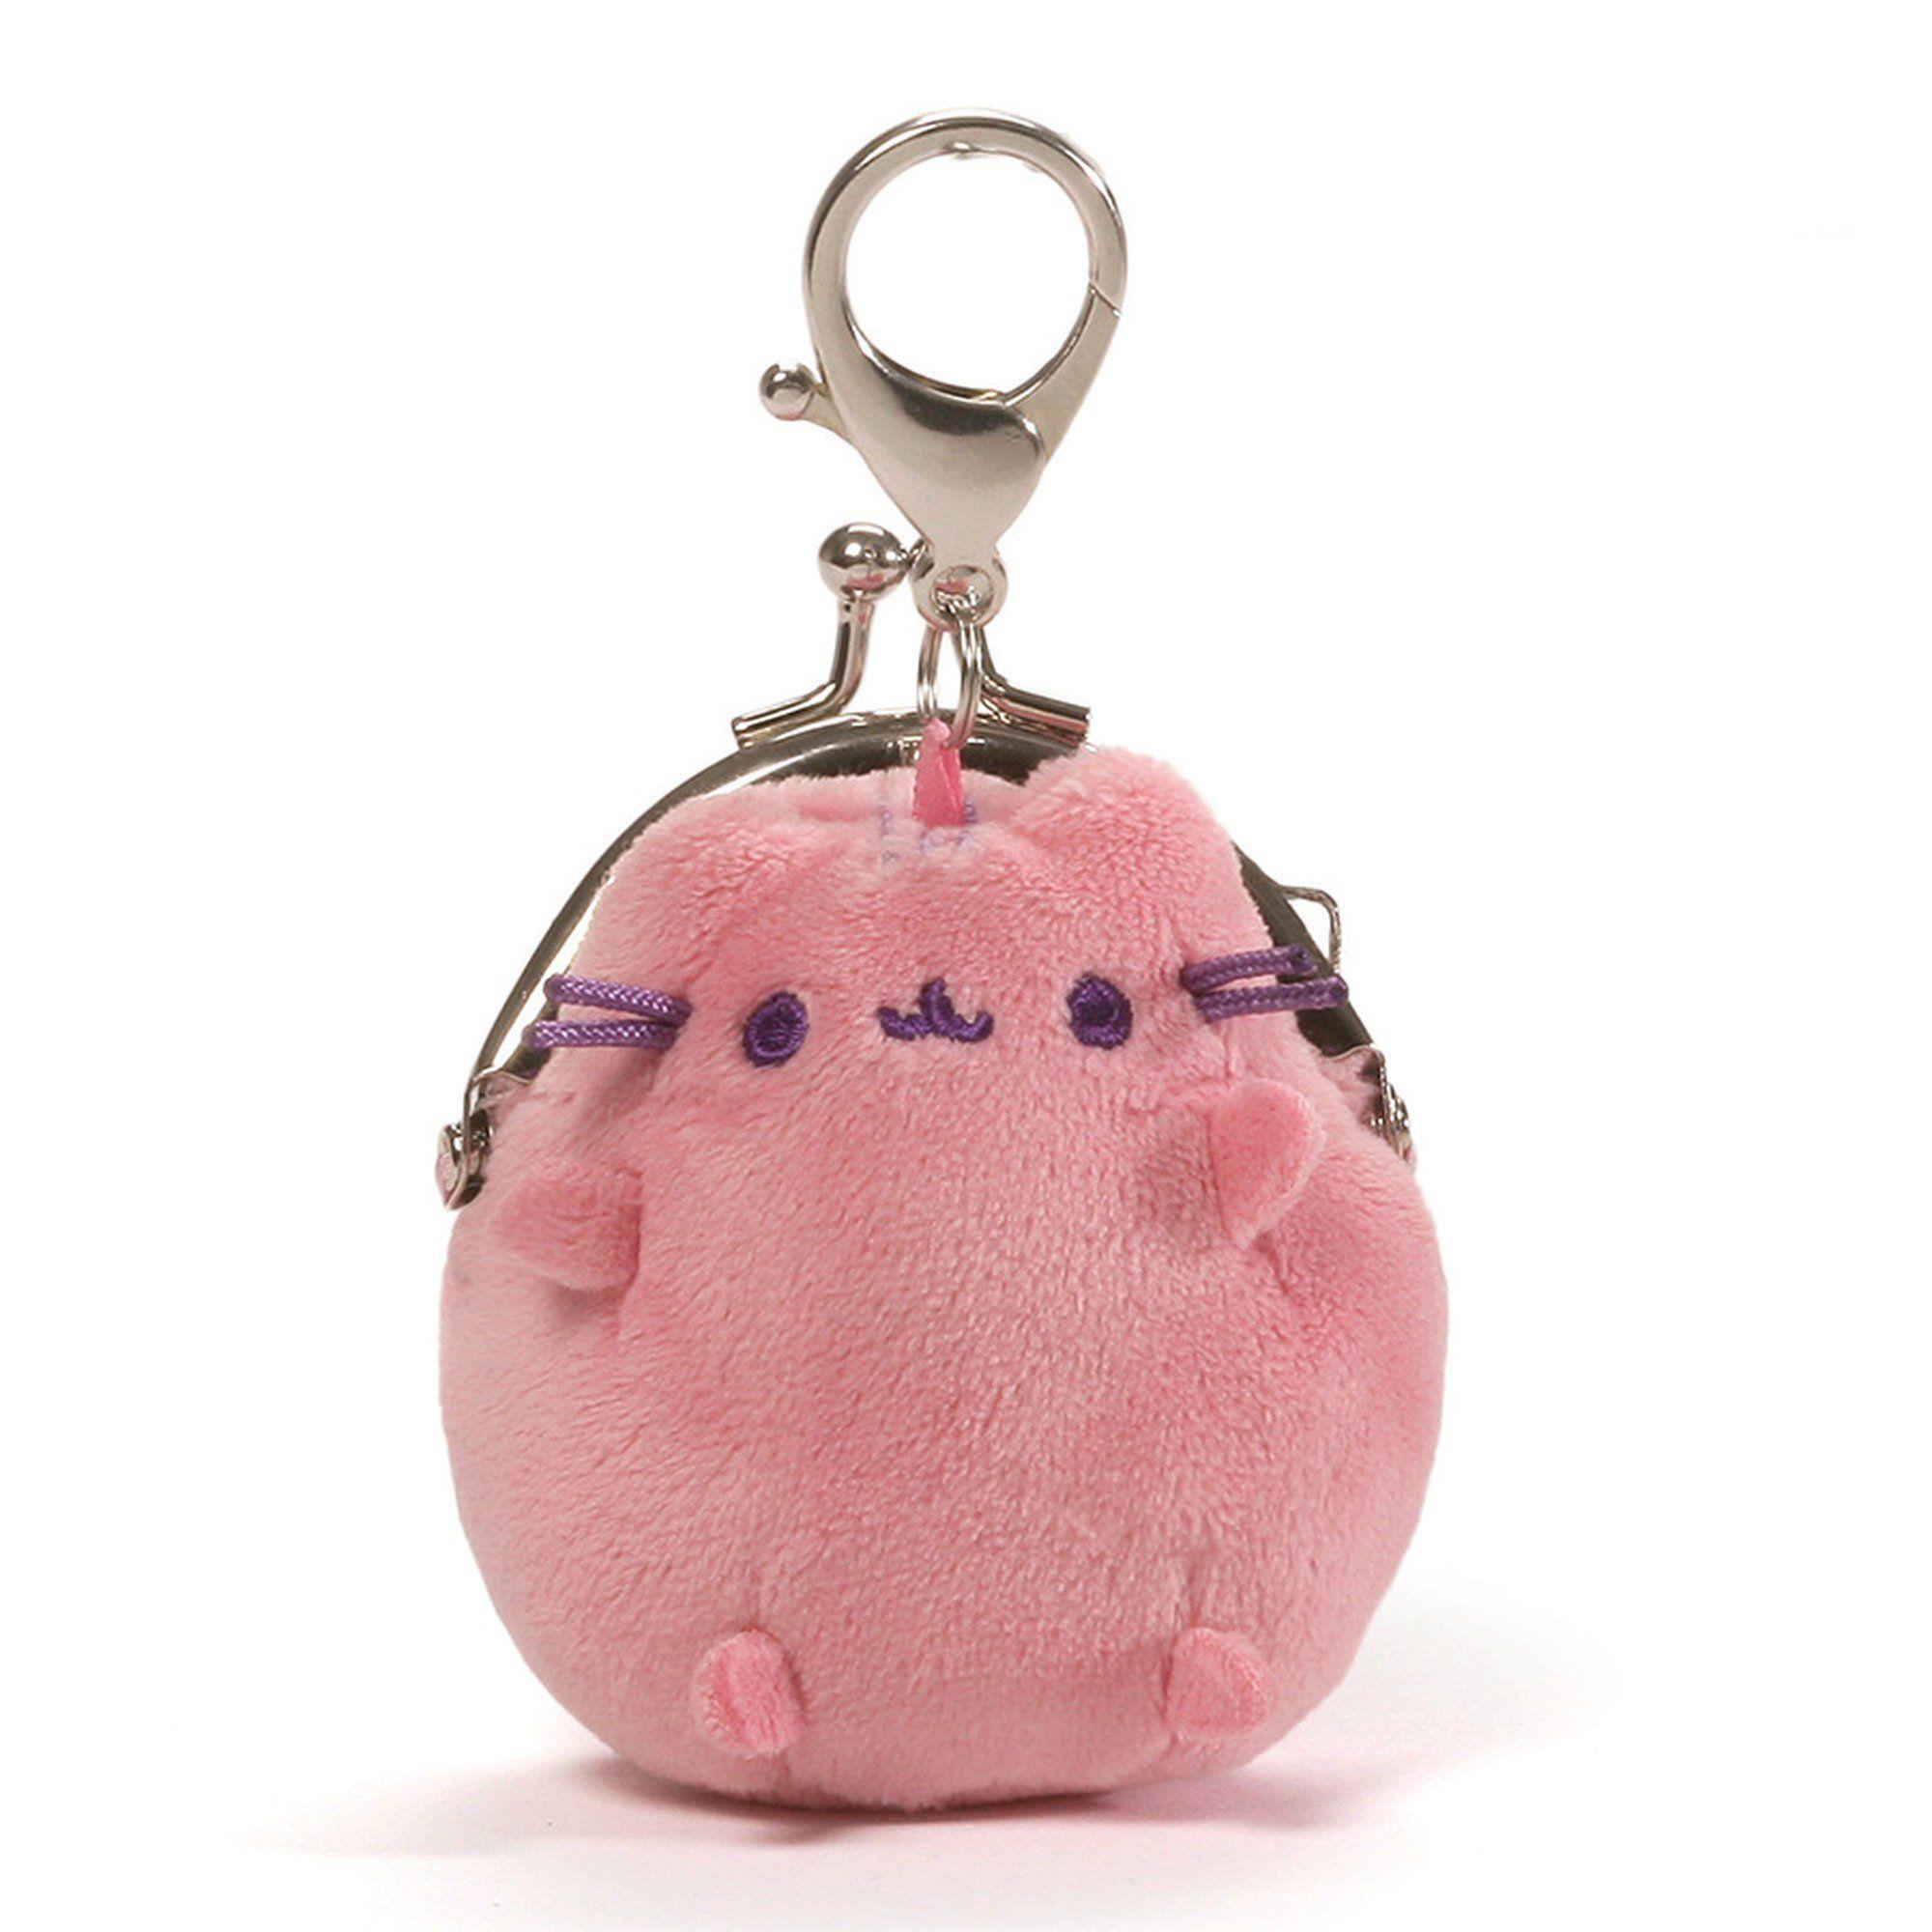 Gund Pusheen The Cat Mini Plush Coin Purse Pastel Pink Cheshire Pusheen Pusheen Coin Purse Coin Purse Purses [ 2000 x 2000 Pixel ]